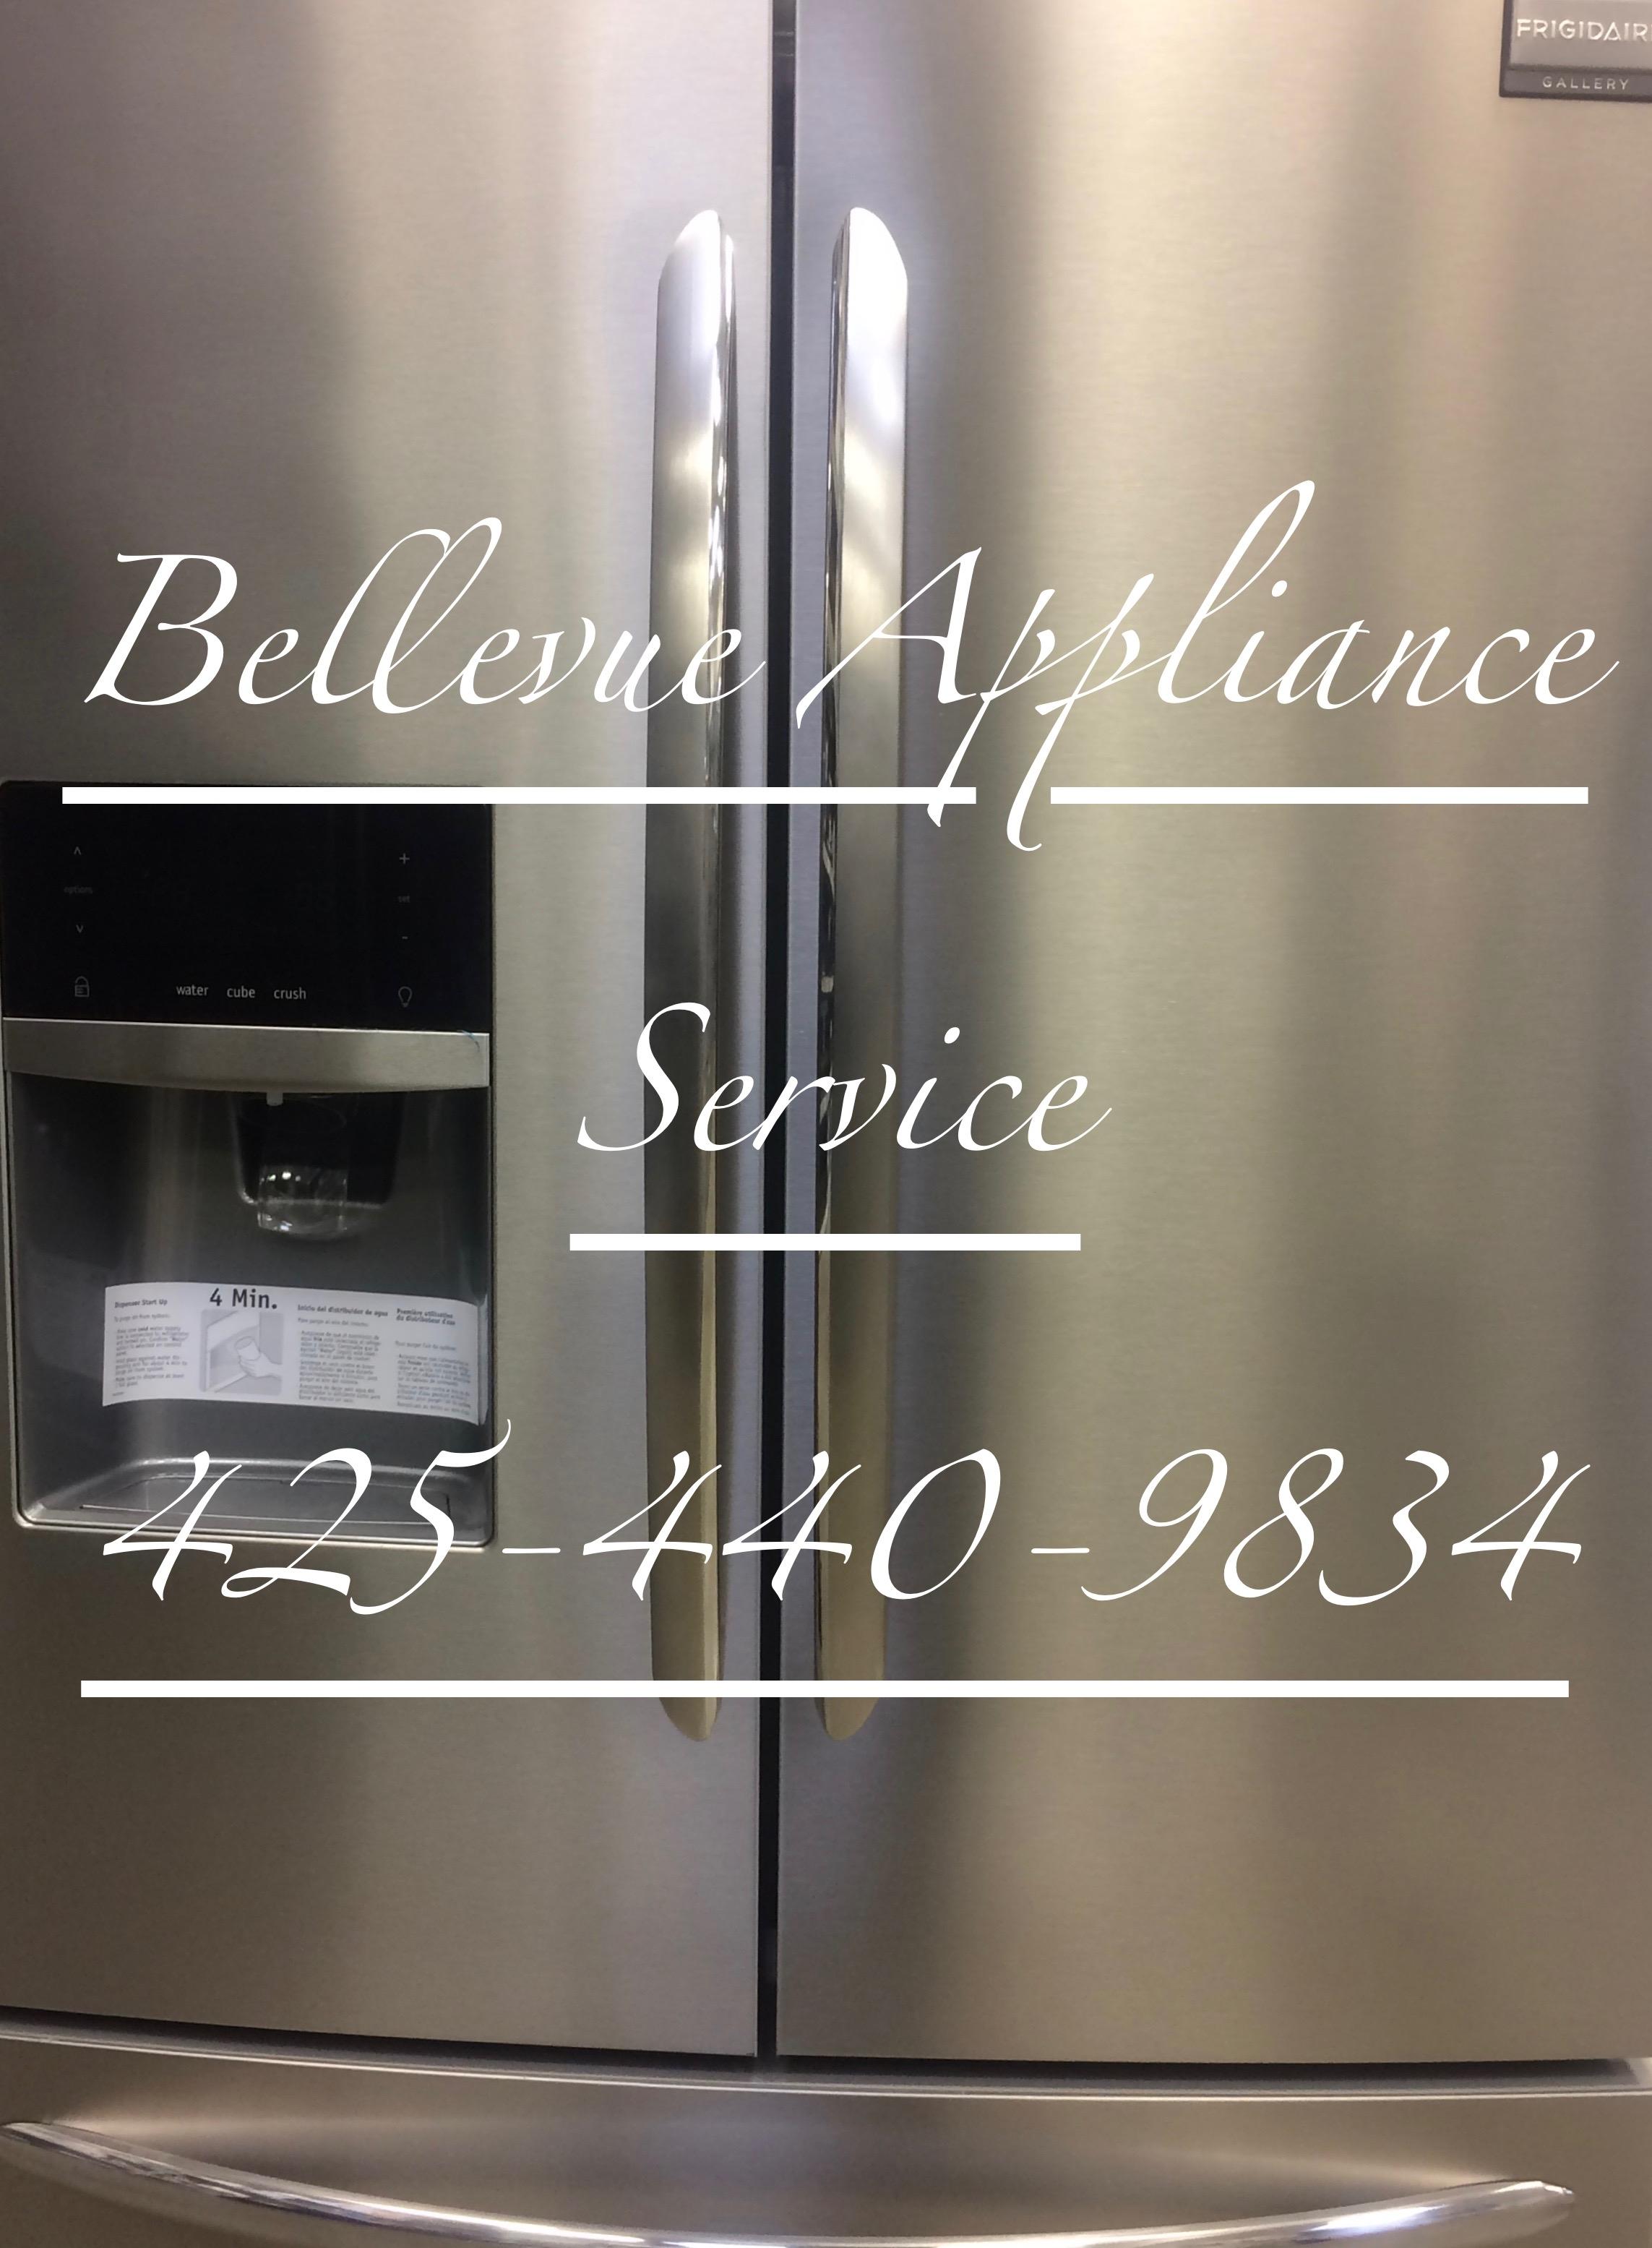 Bellevue Appliance Service image 3